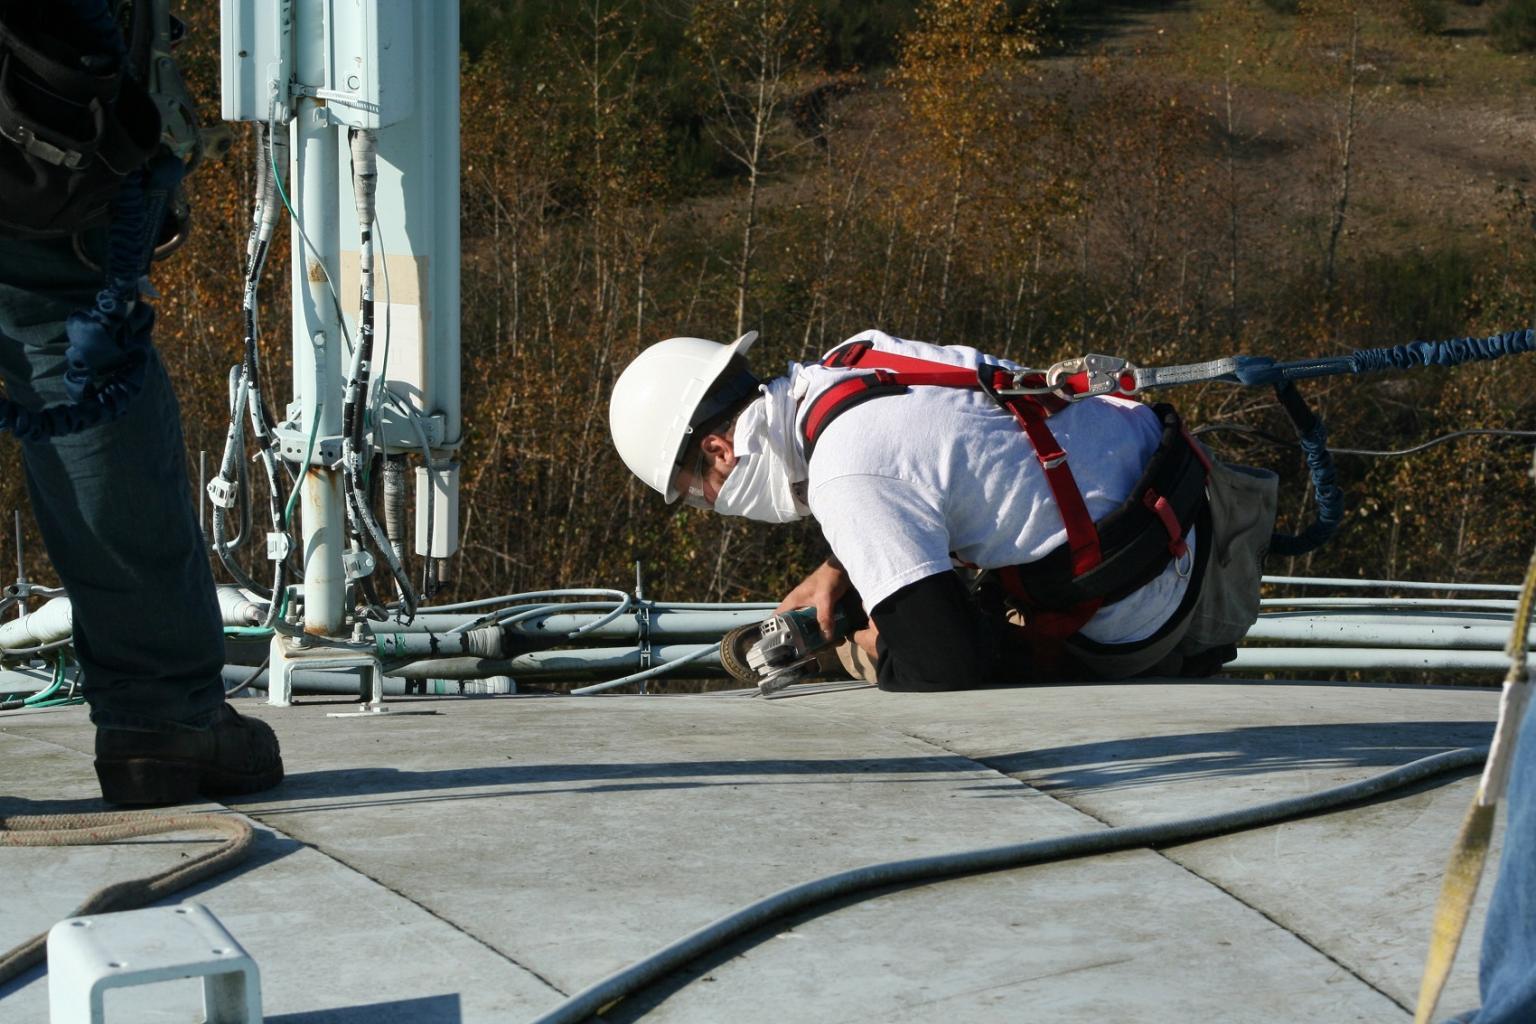 Optimal surface preparation achieved prior to bonding